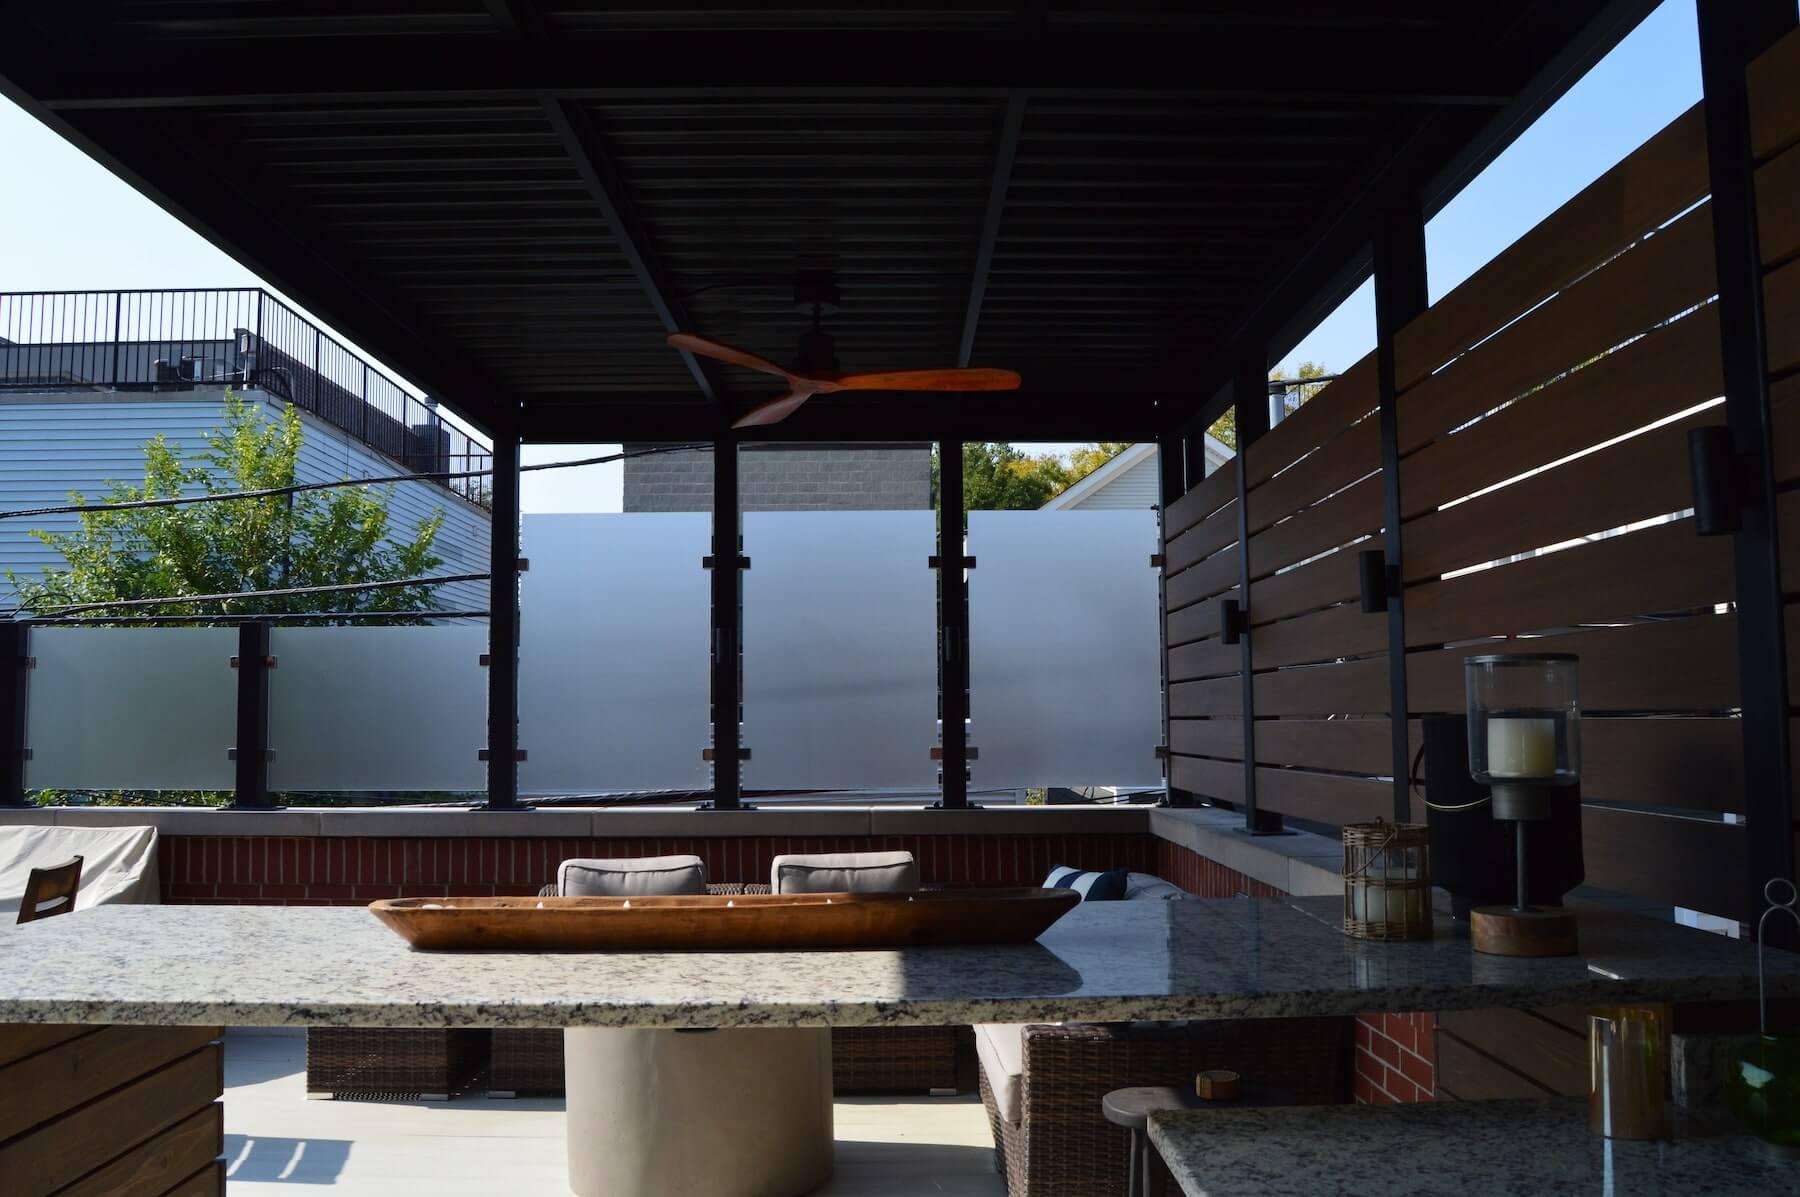 rooftop deck steel pergola privacy screen chicago il